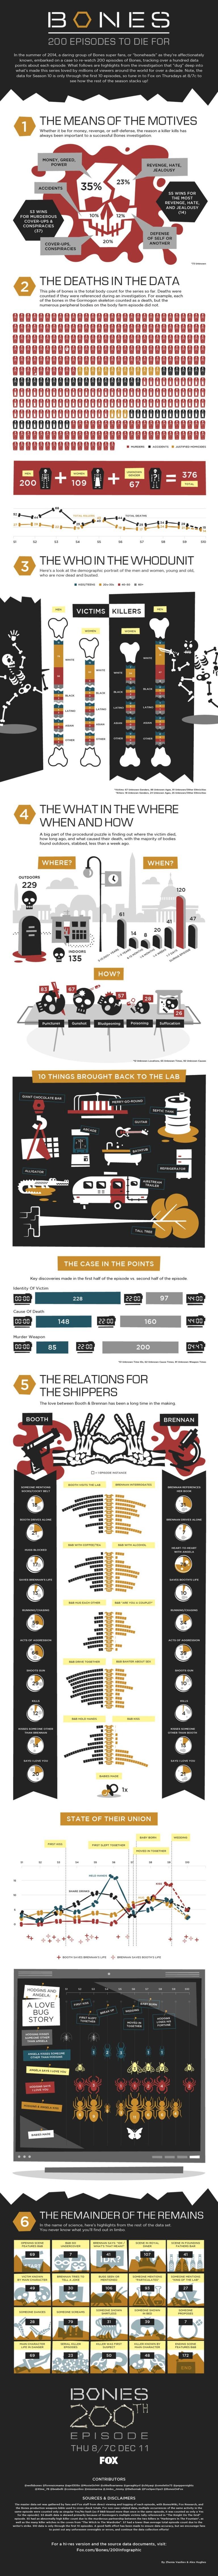 Bones-200th-Infographic-12-4-14-final